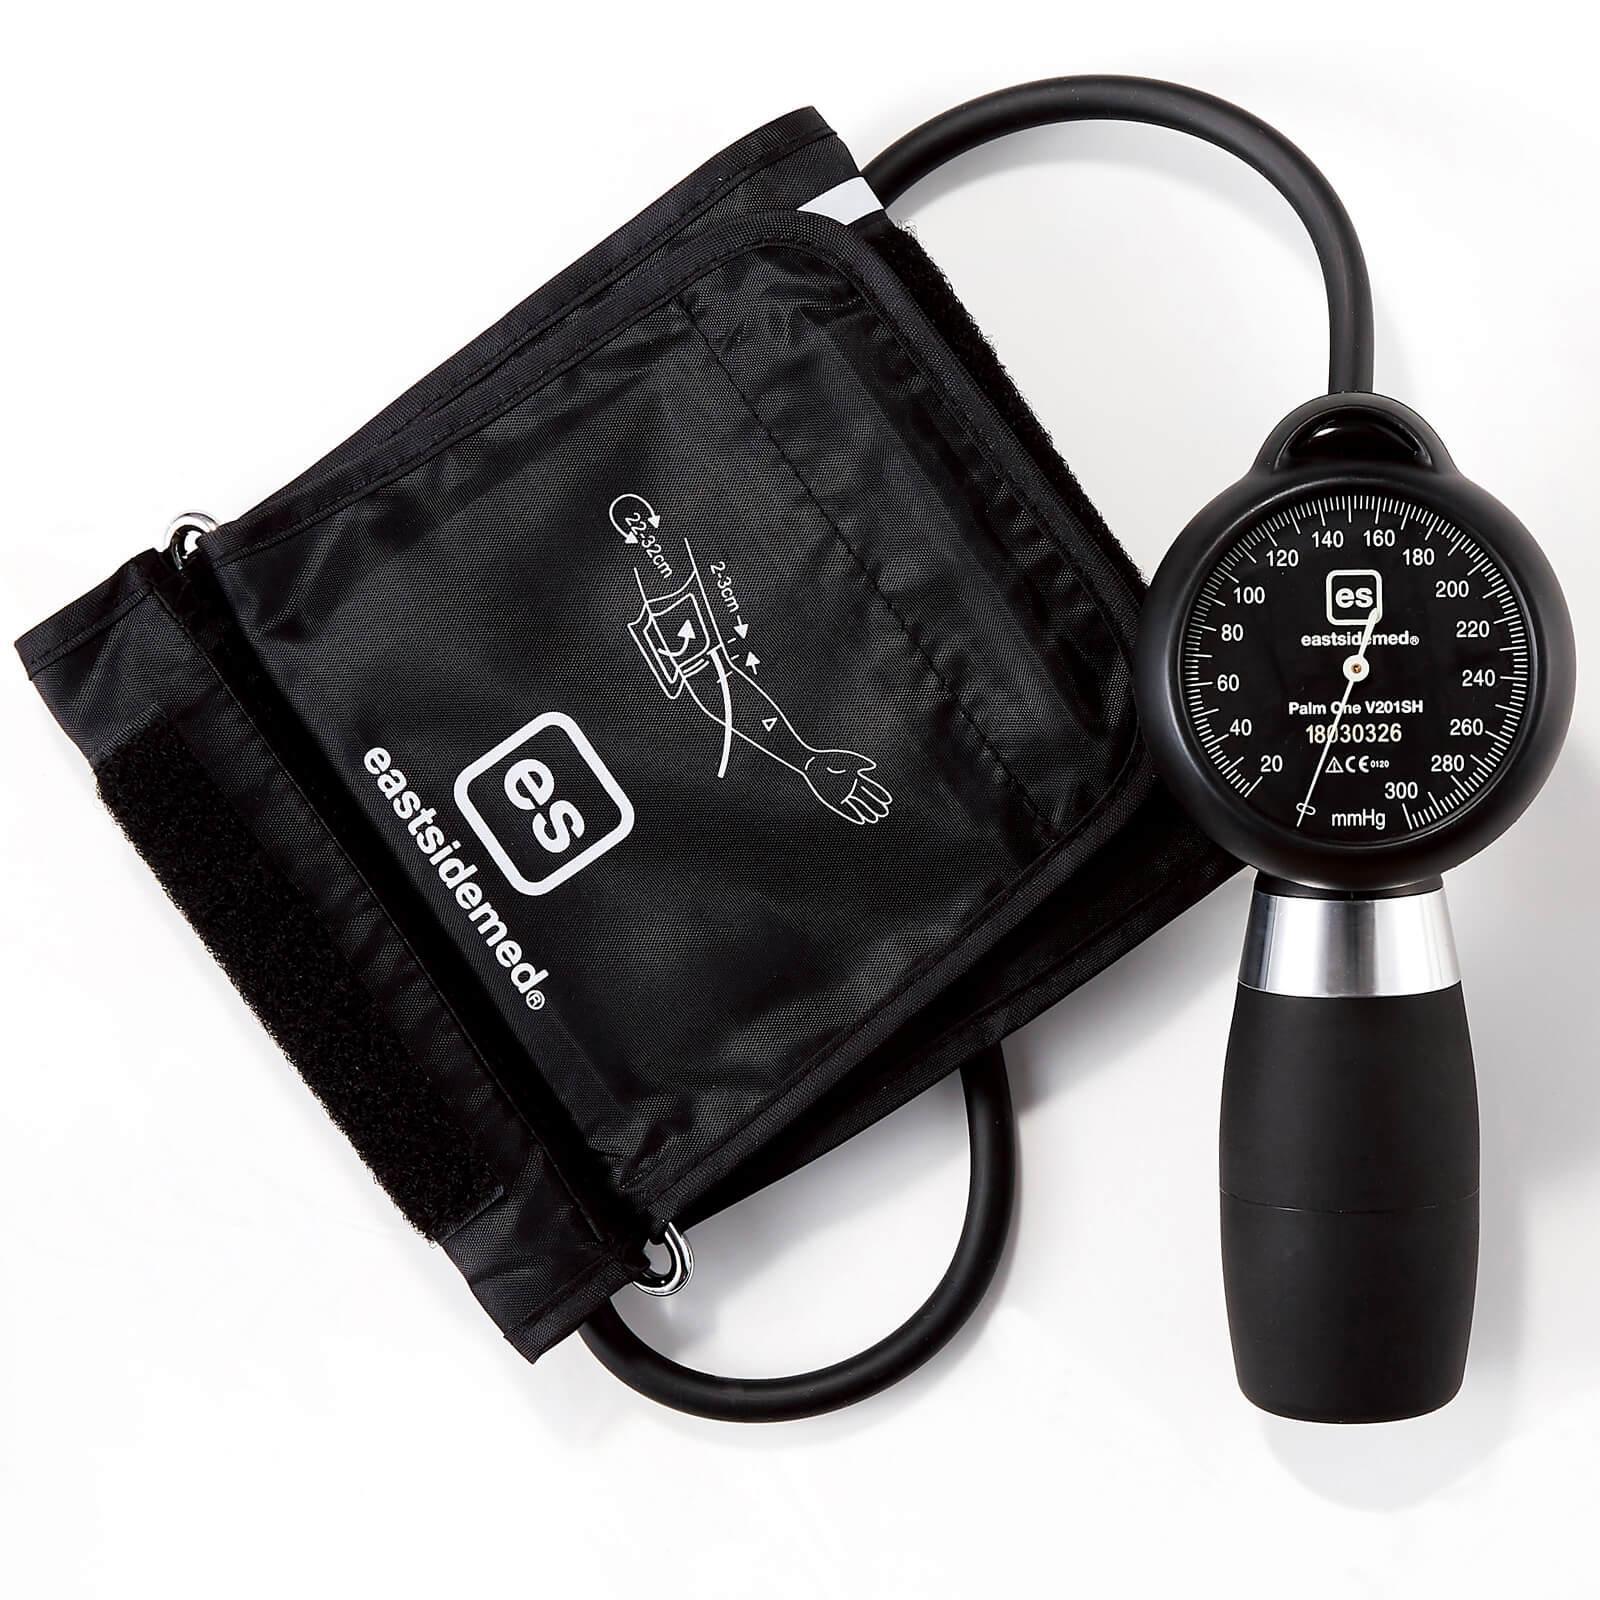 IMG マノメーター Palm One V201SH[医療 ナース 看護 介護 ナースグッズ 雑貨]【アンファミエ infirmiere】 9152125 304872